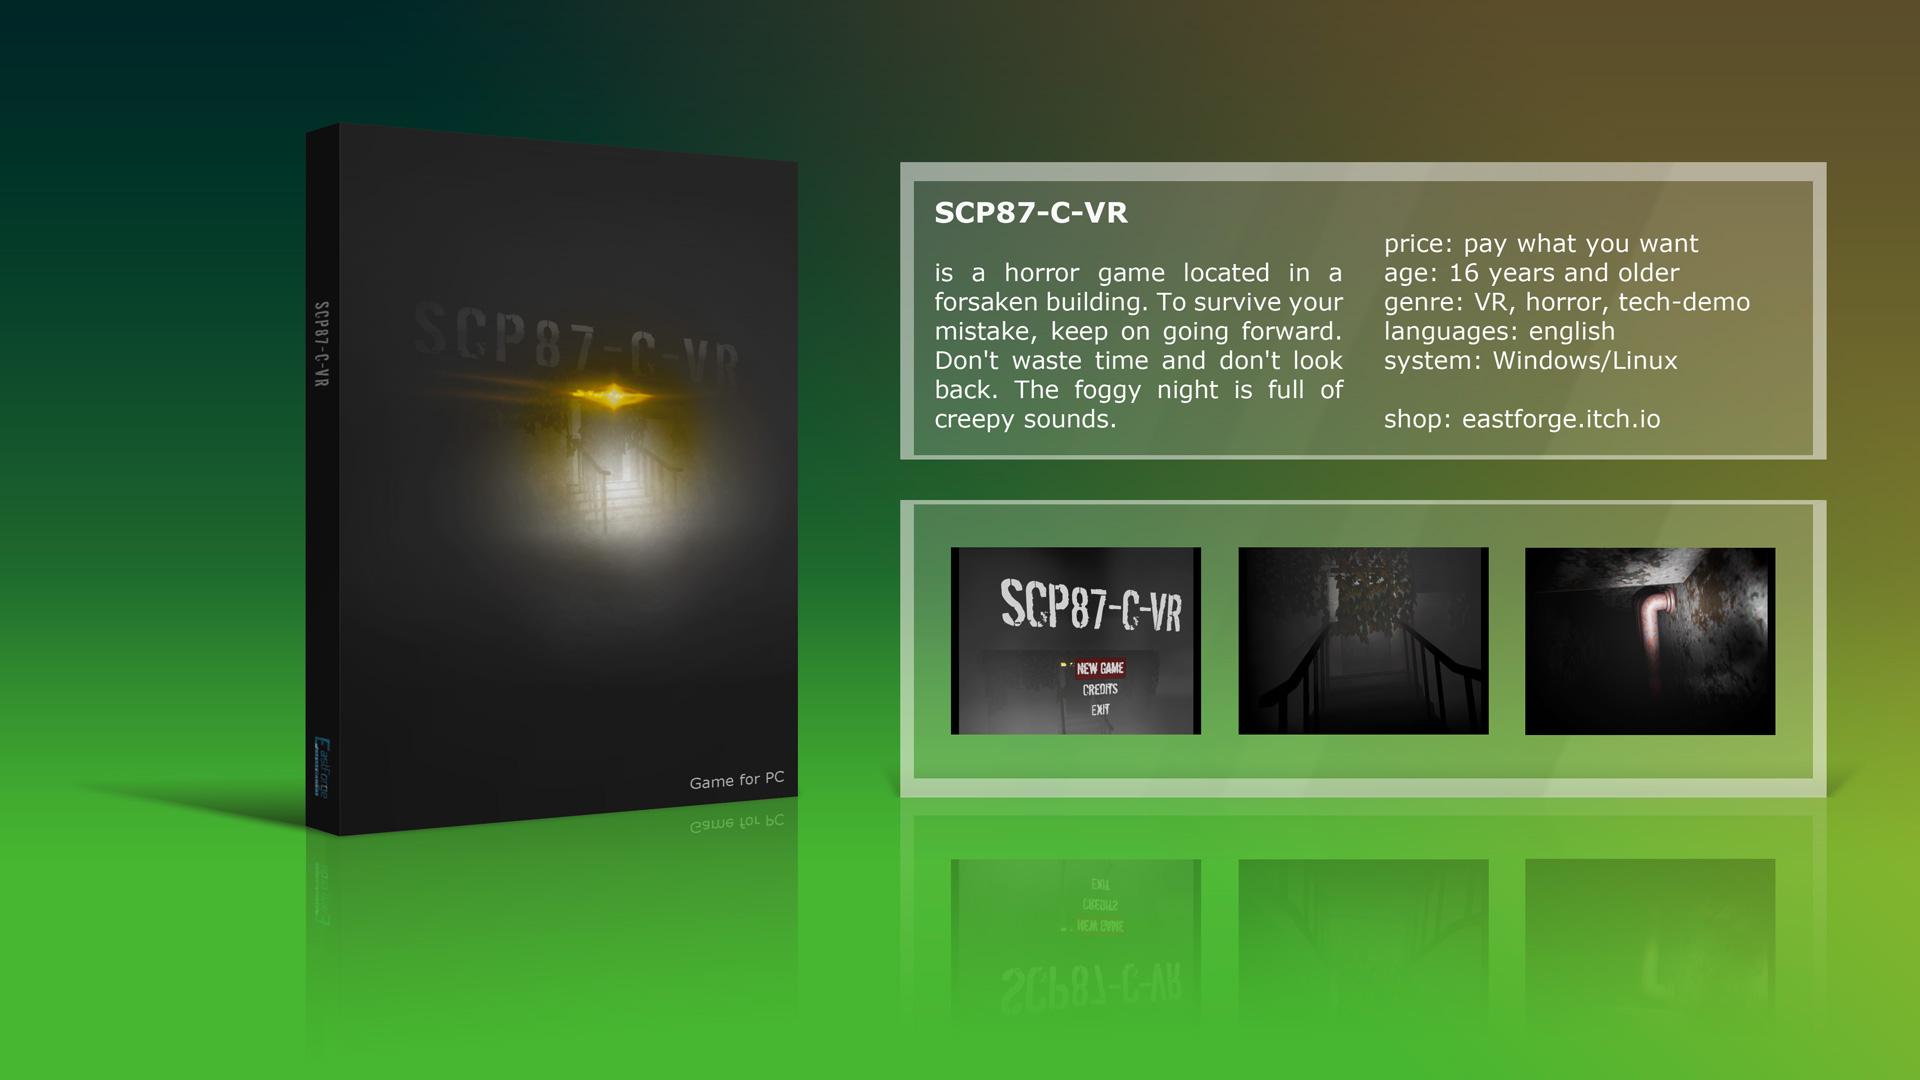 SCP87-C-VR